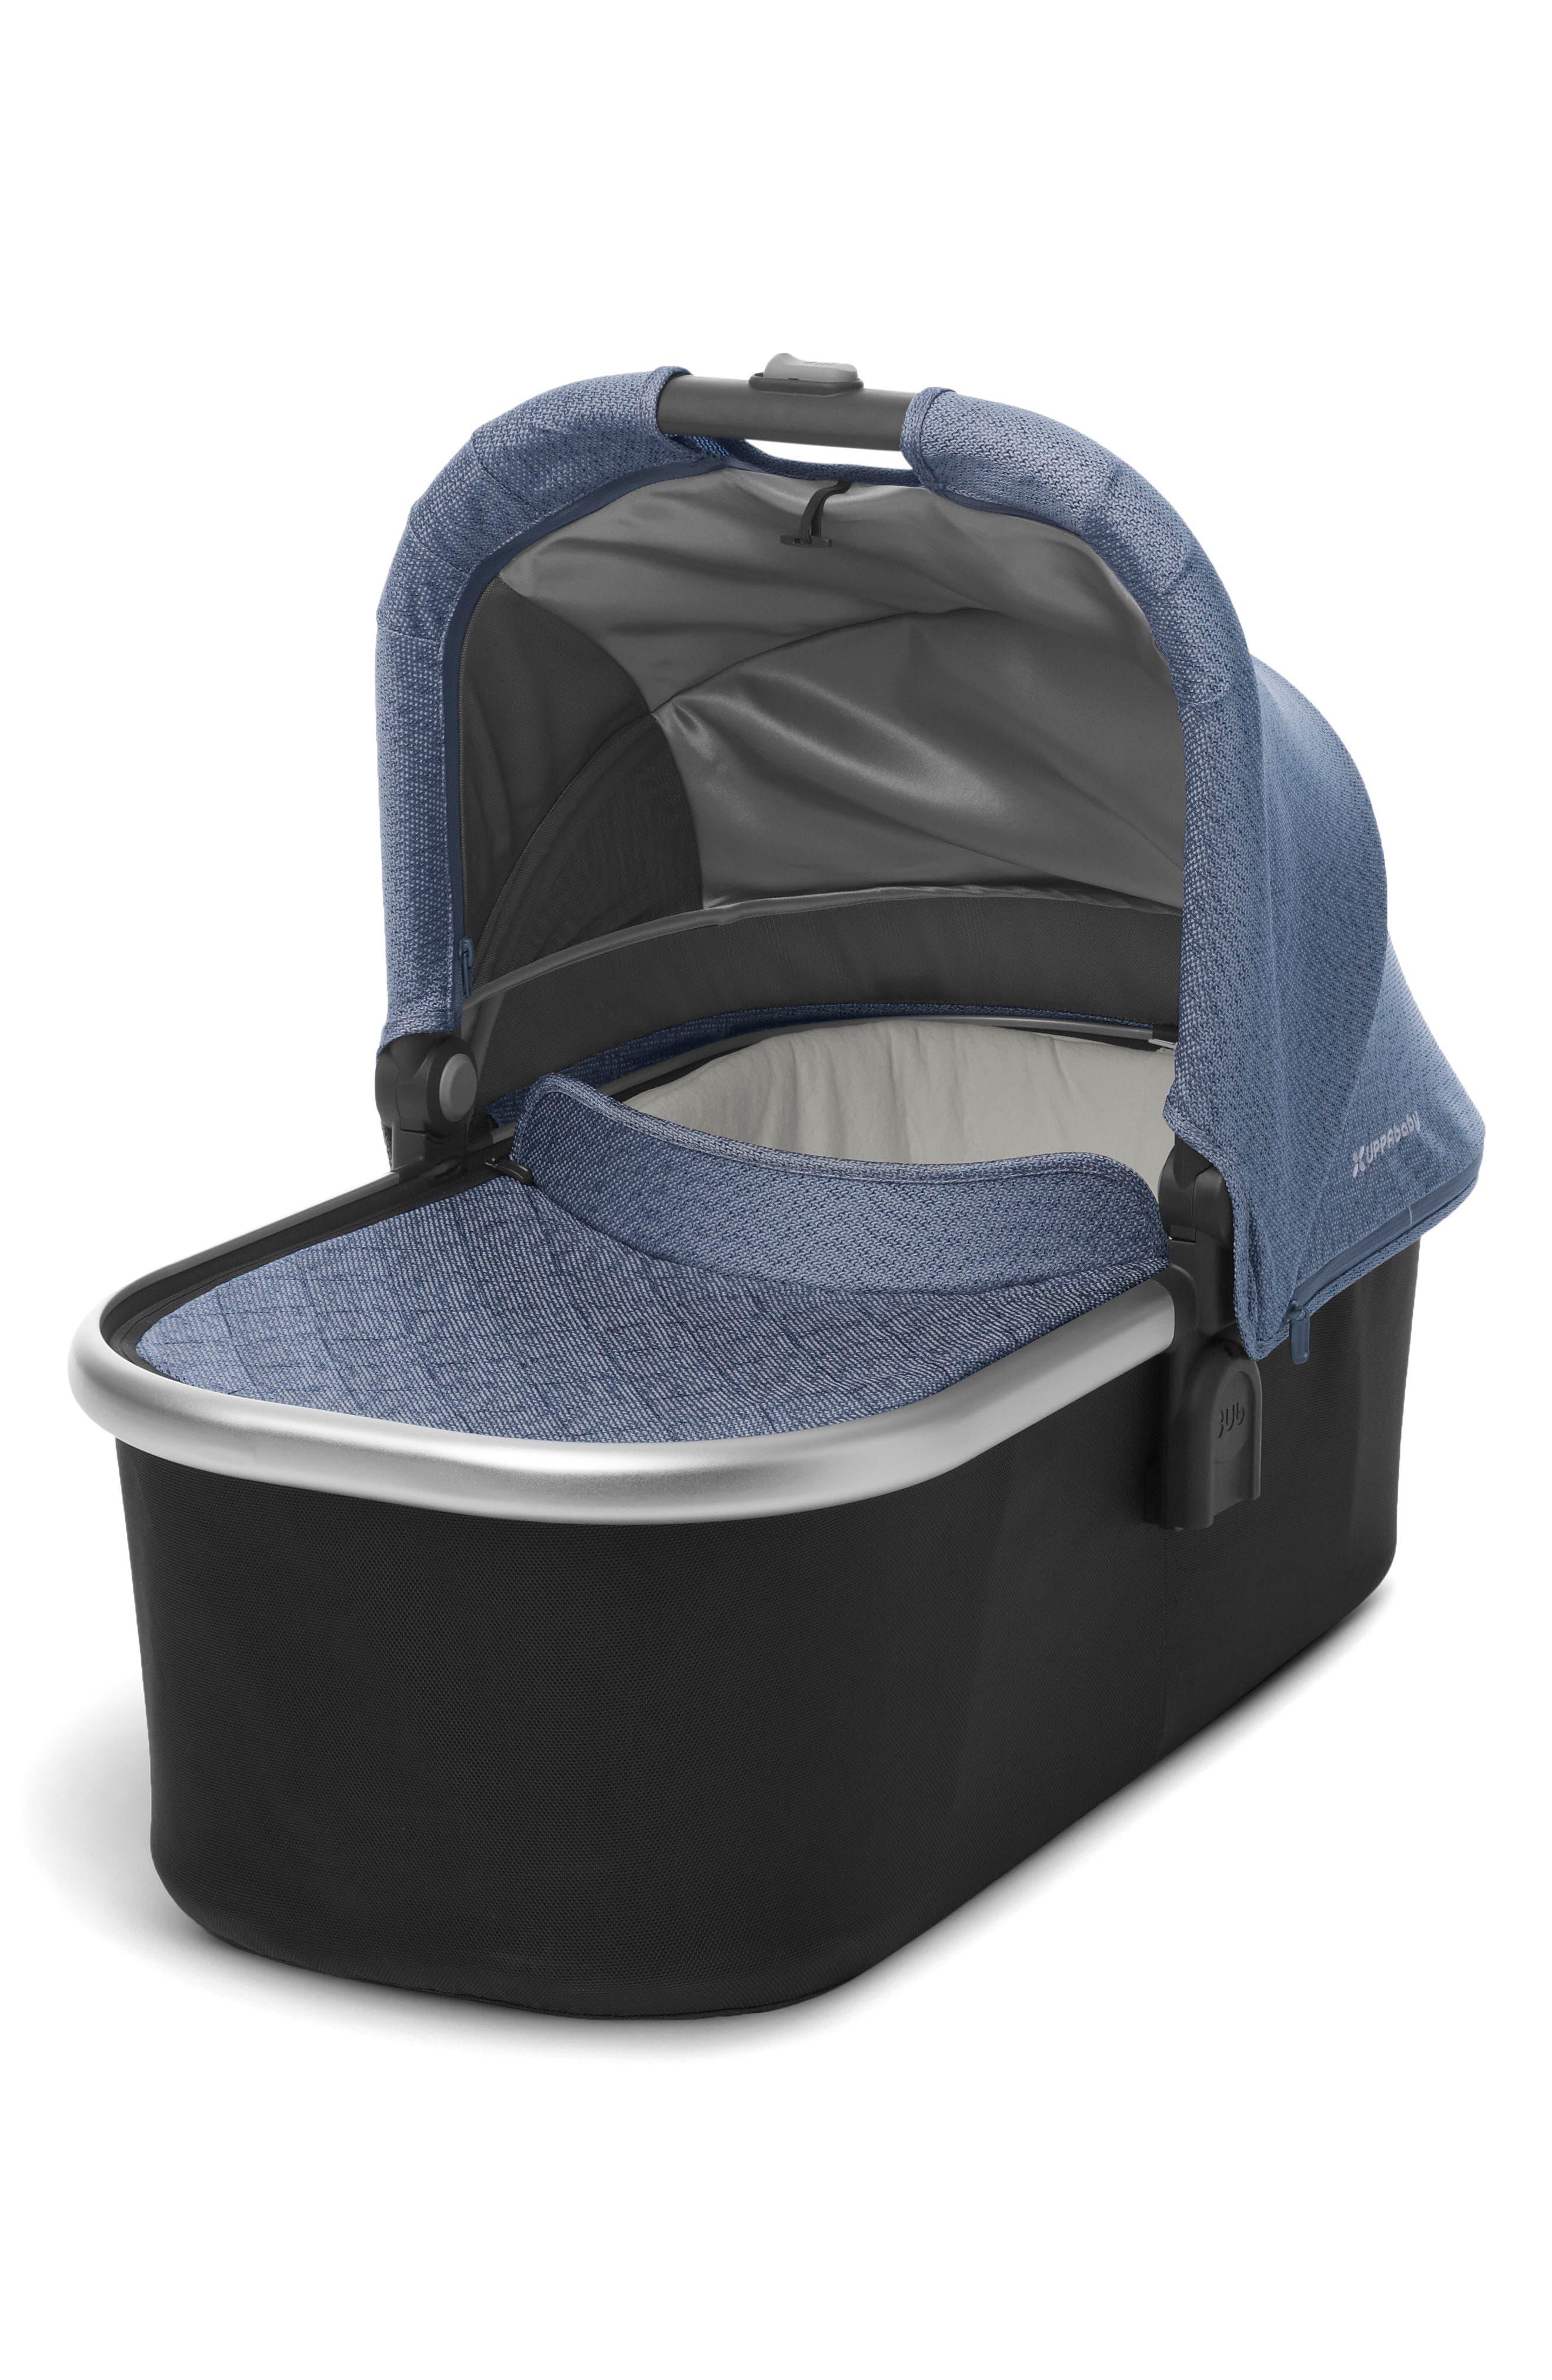 Bassinet for CRUZ or VISTA Strollers,                         Main,                         color, Blue Marl/ Silver